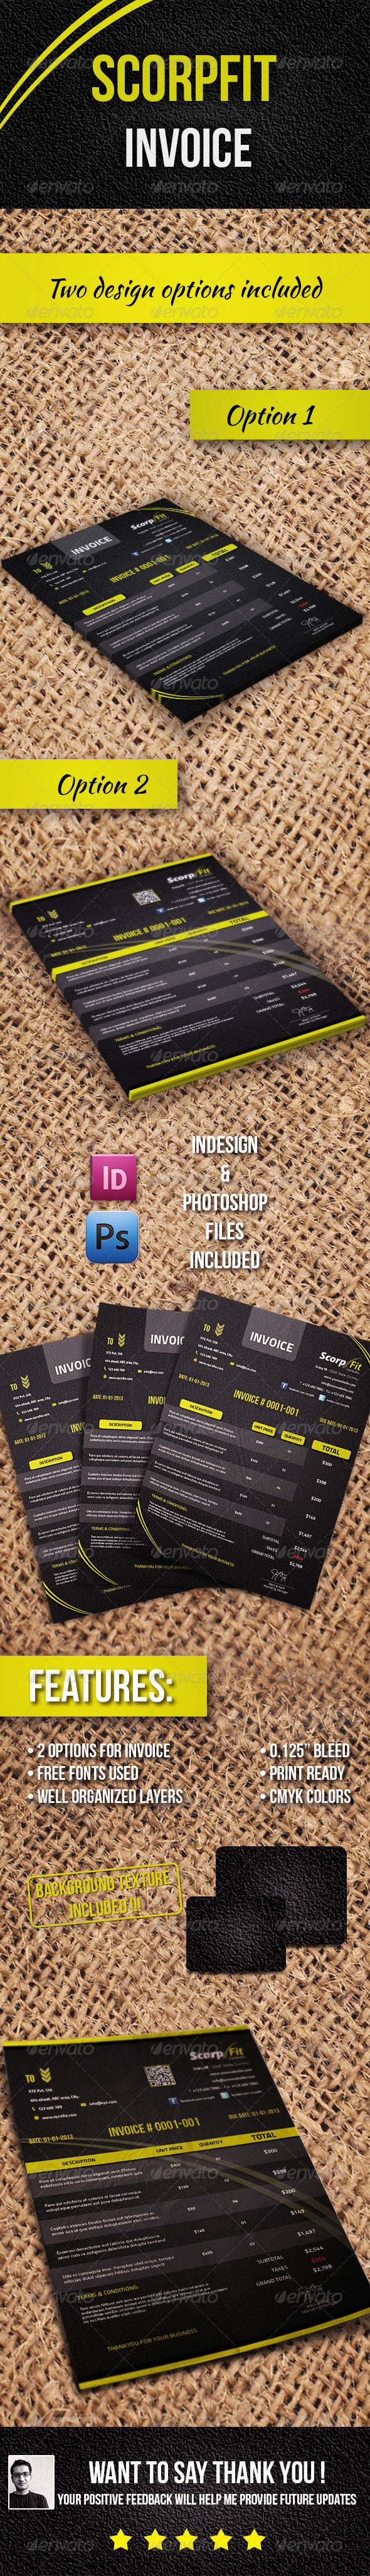 GraphicRiver Scorpfit Invoice 4891694